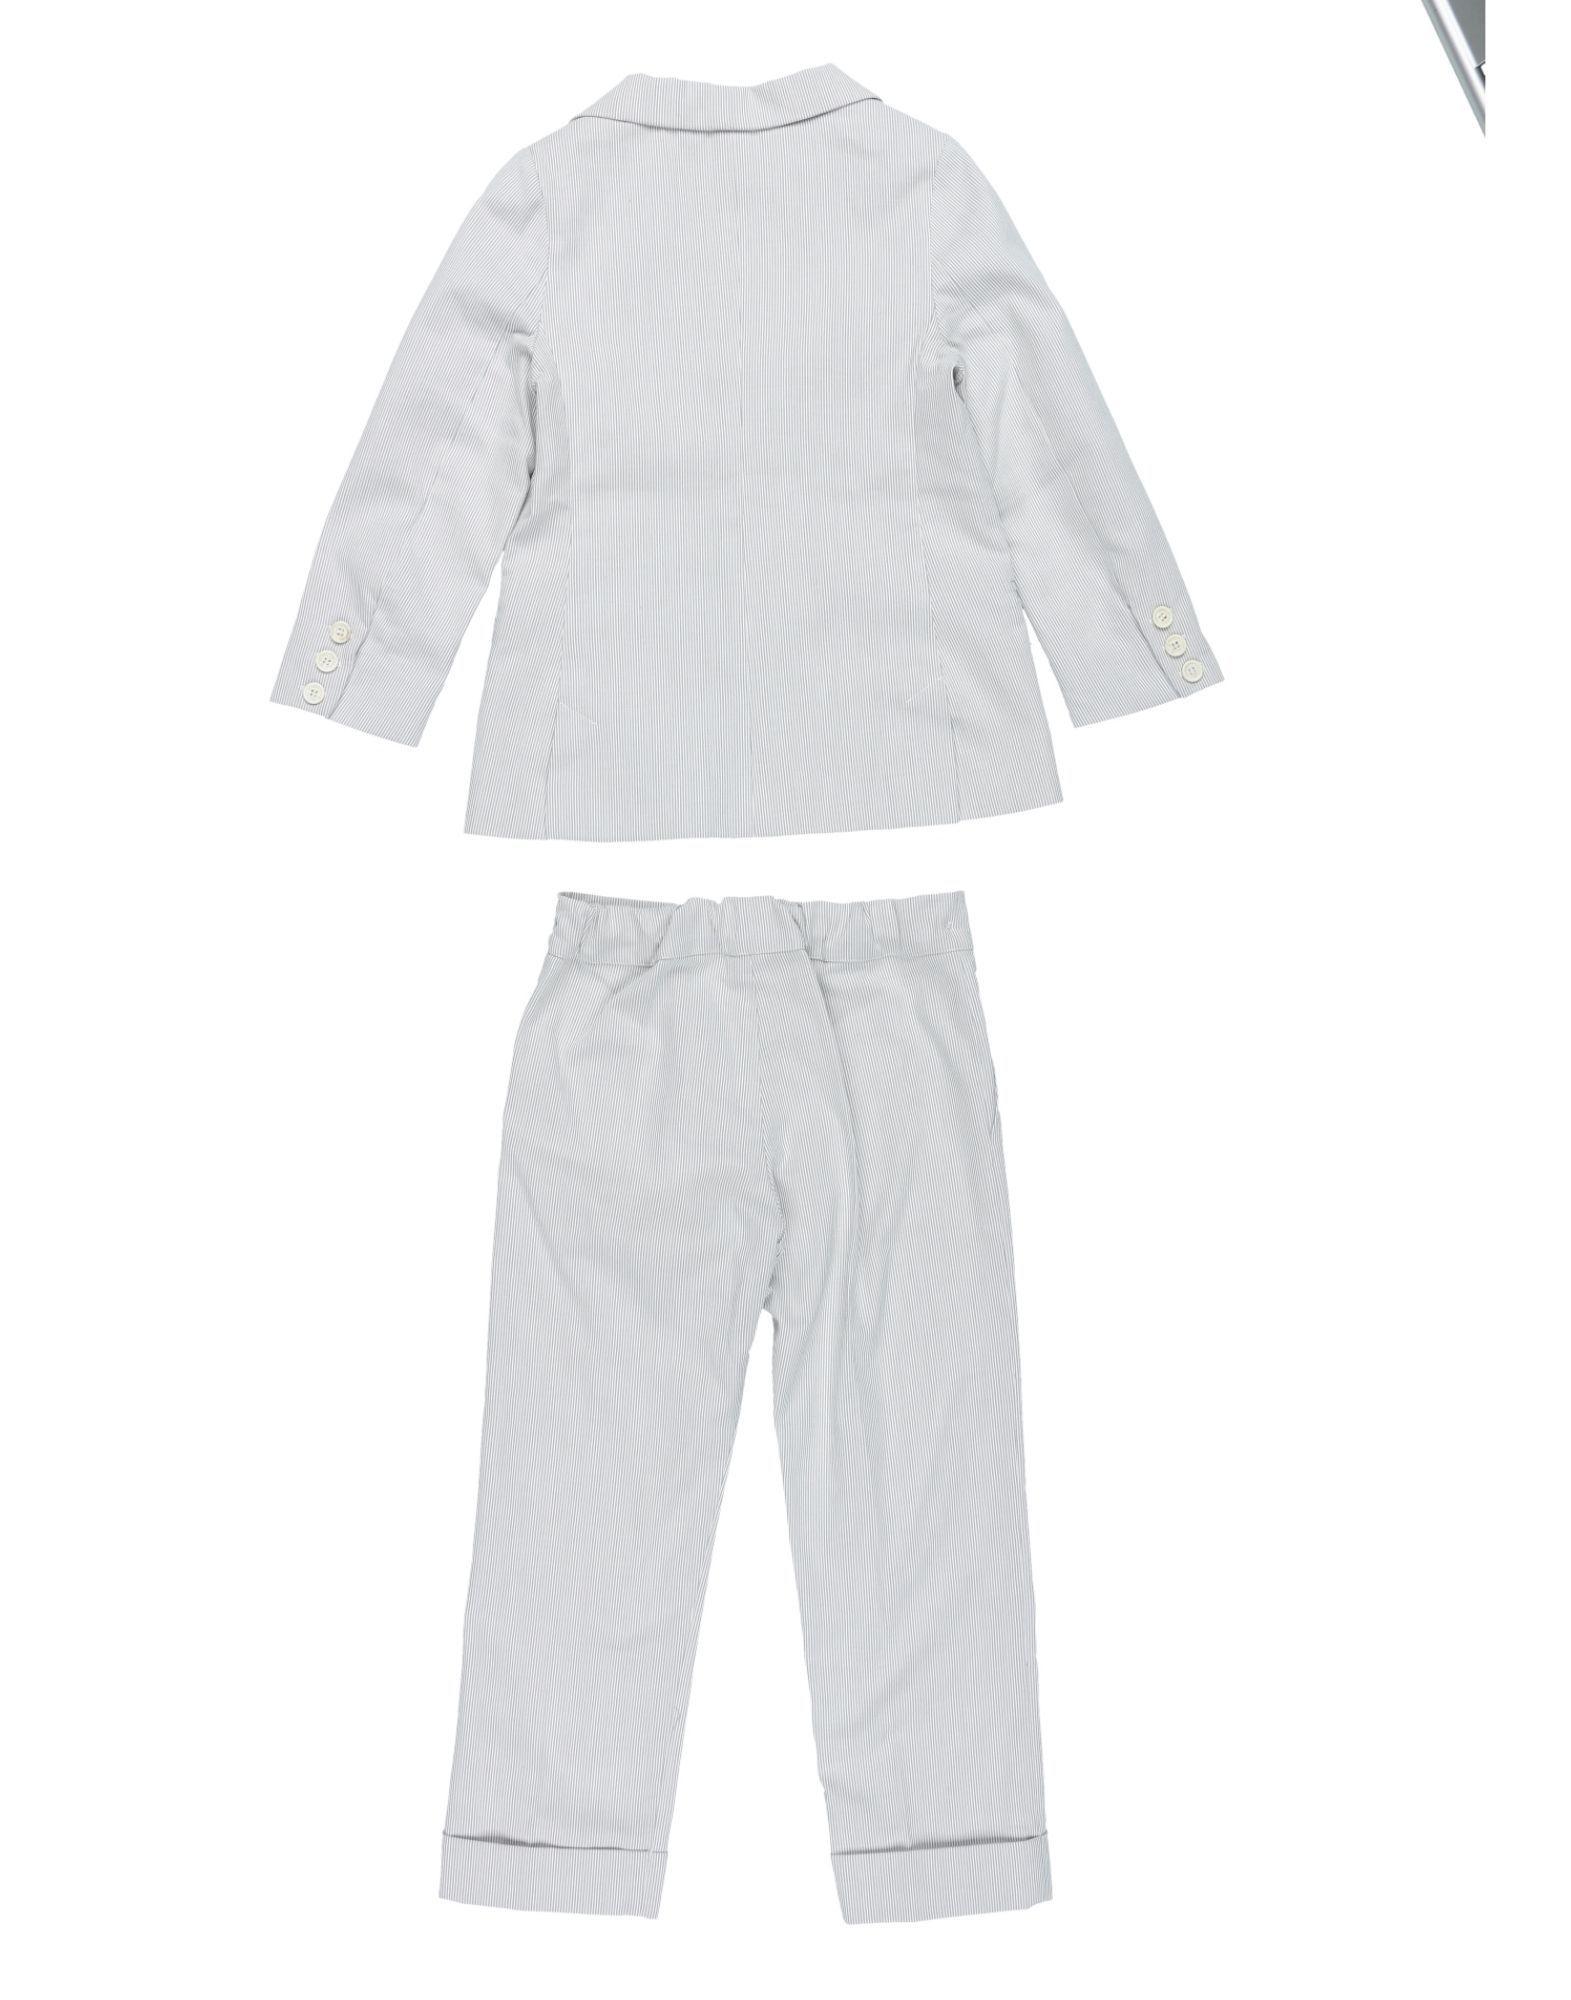 SUITS AND JACKETS La Stupenderia Light grey Boy Cotton